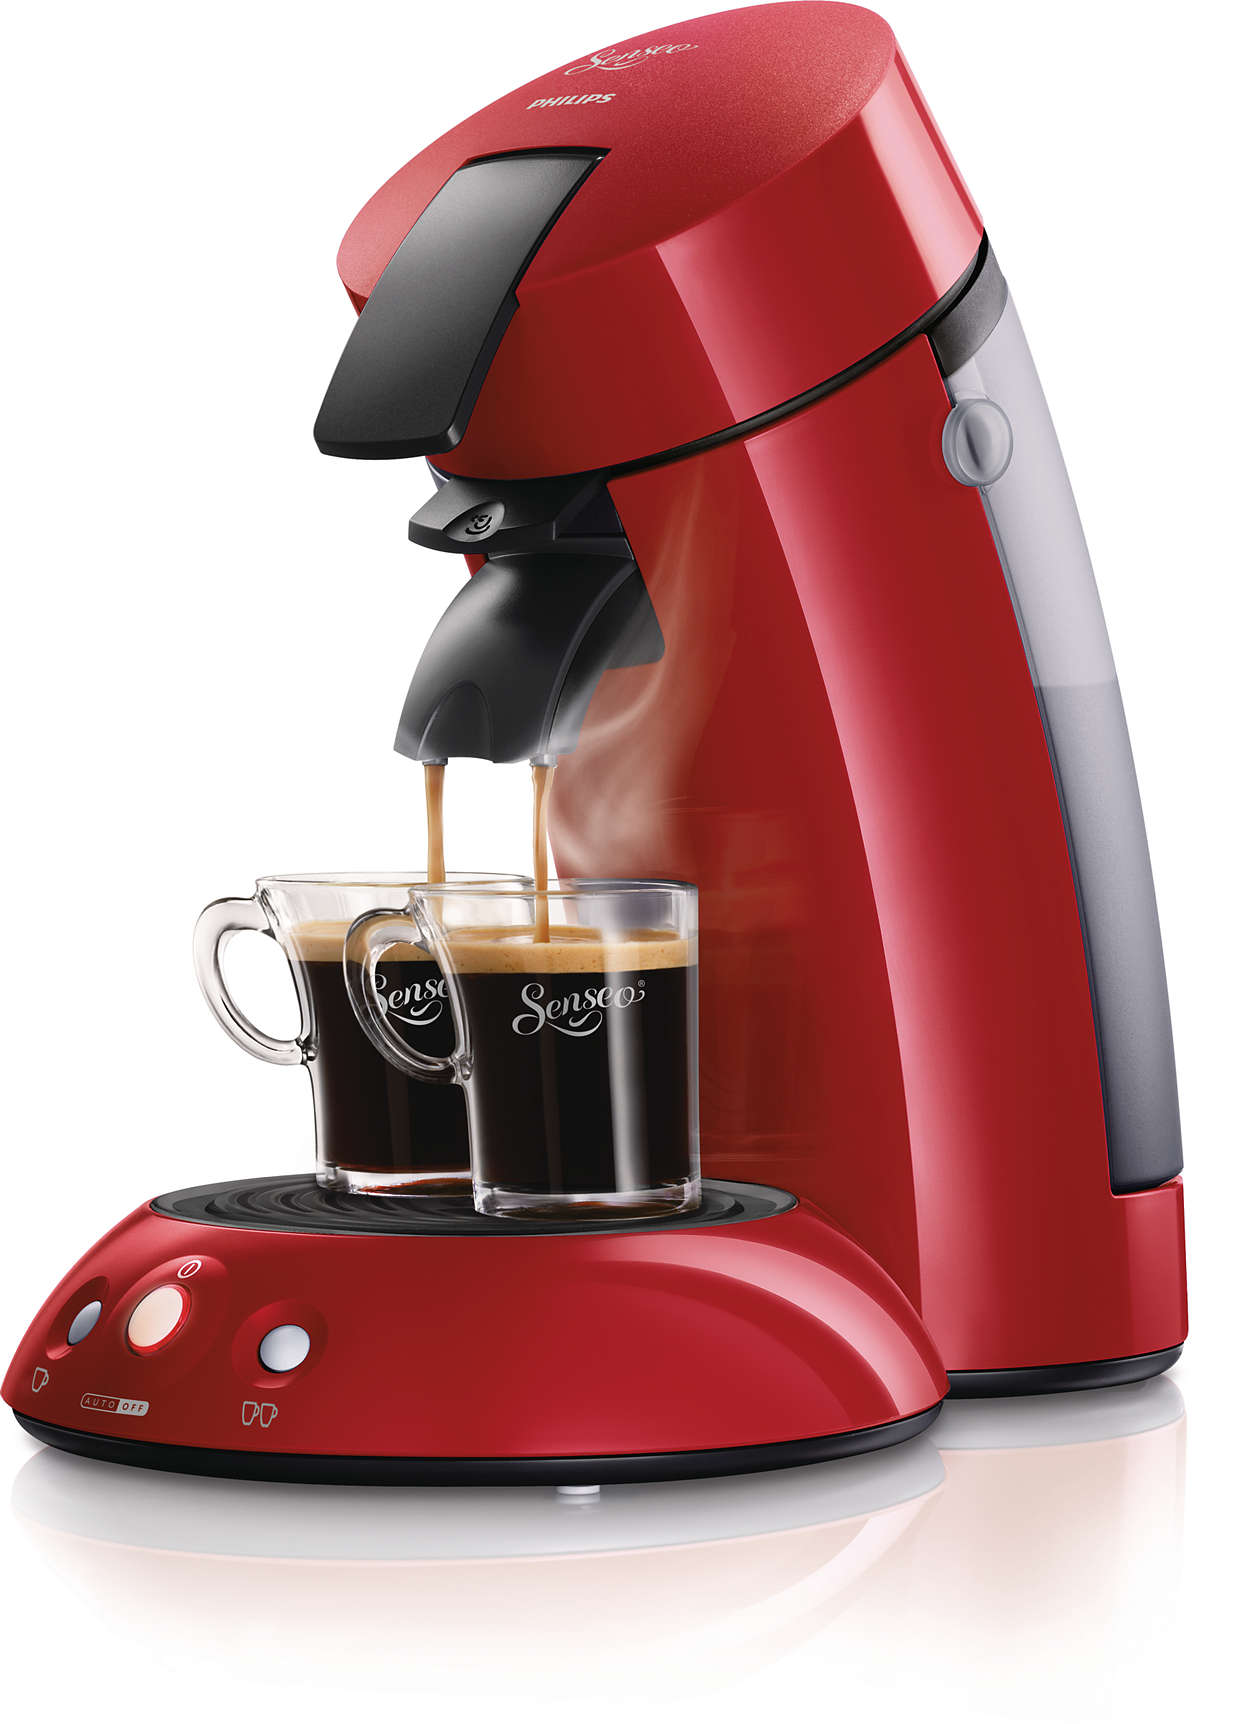 Bare nyt kaffen